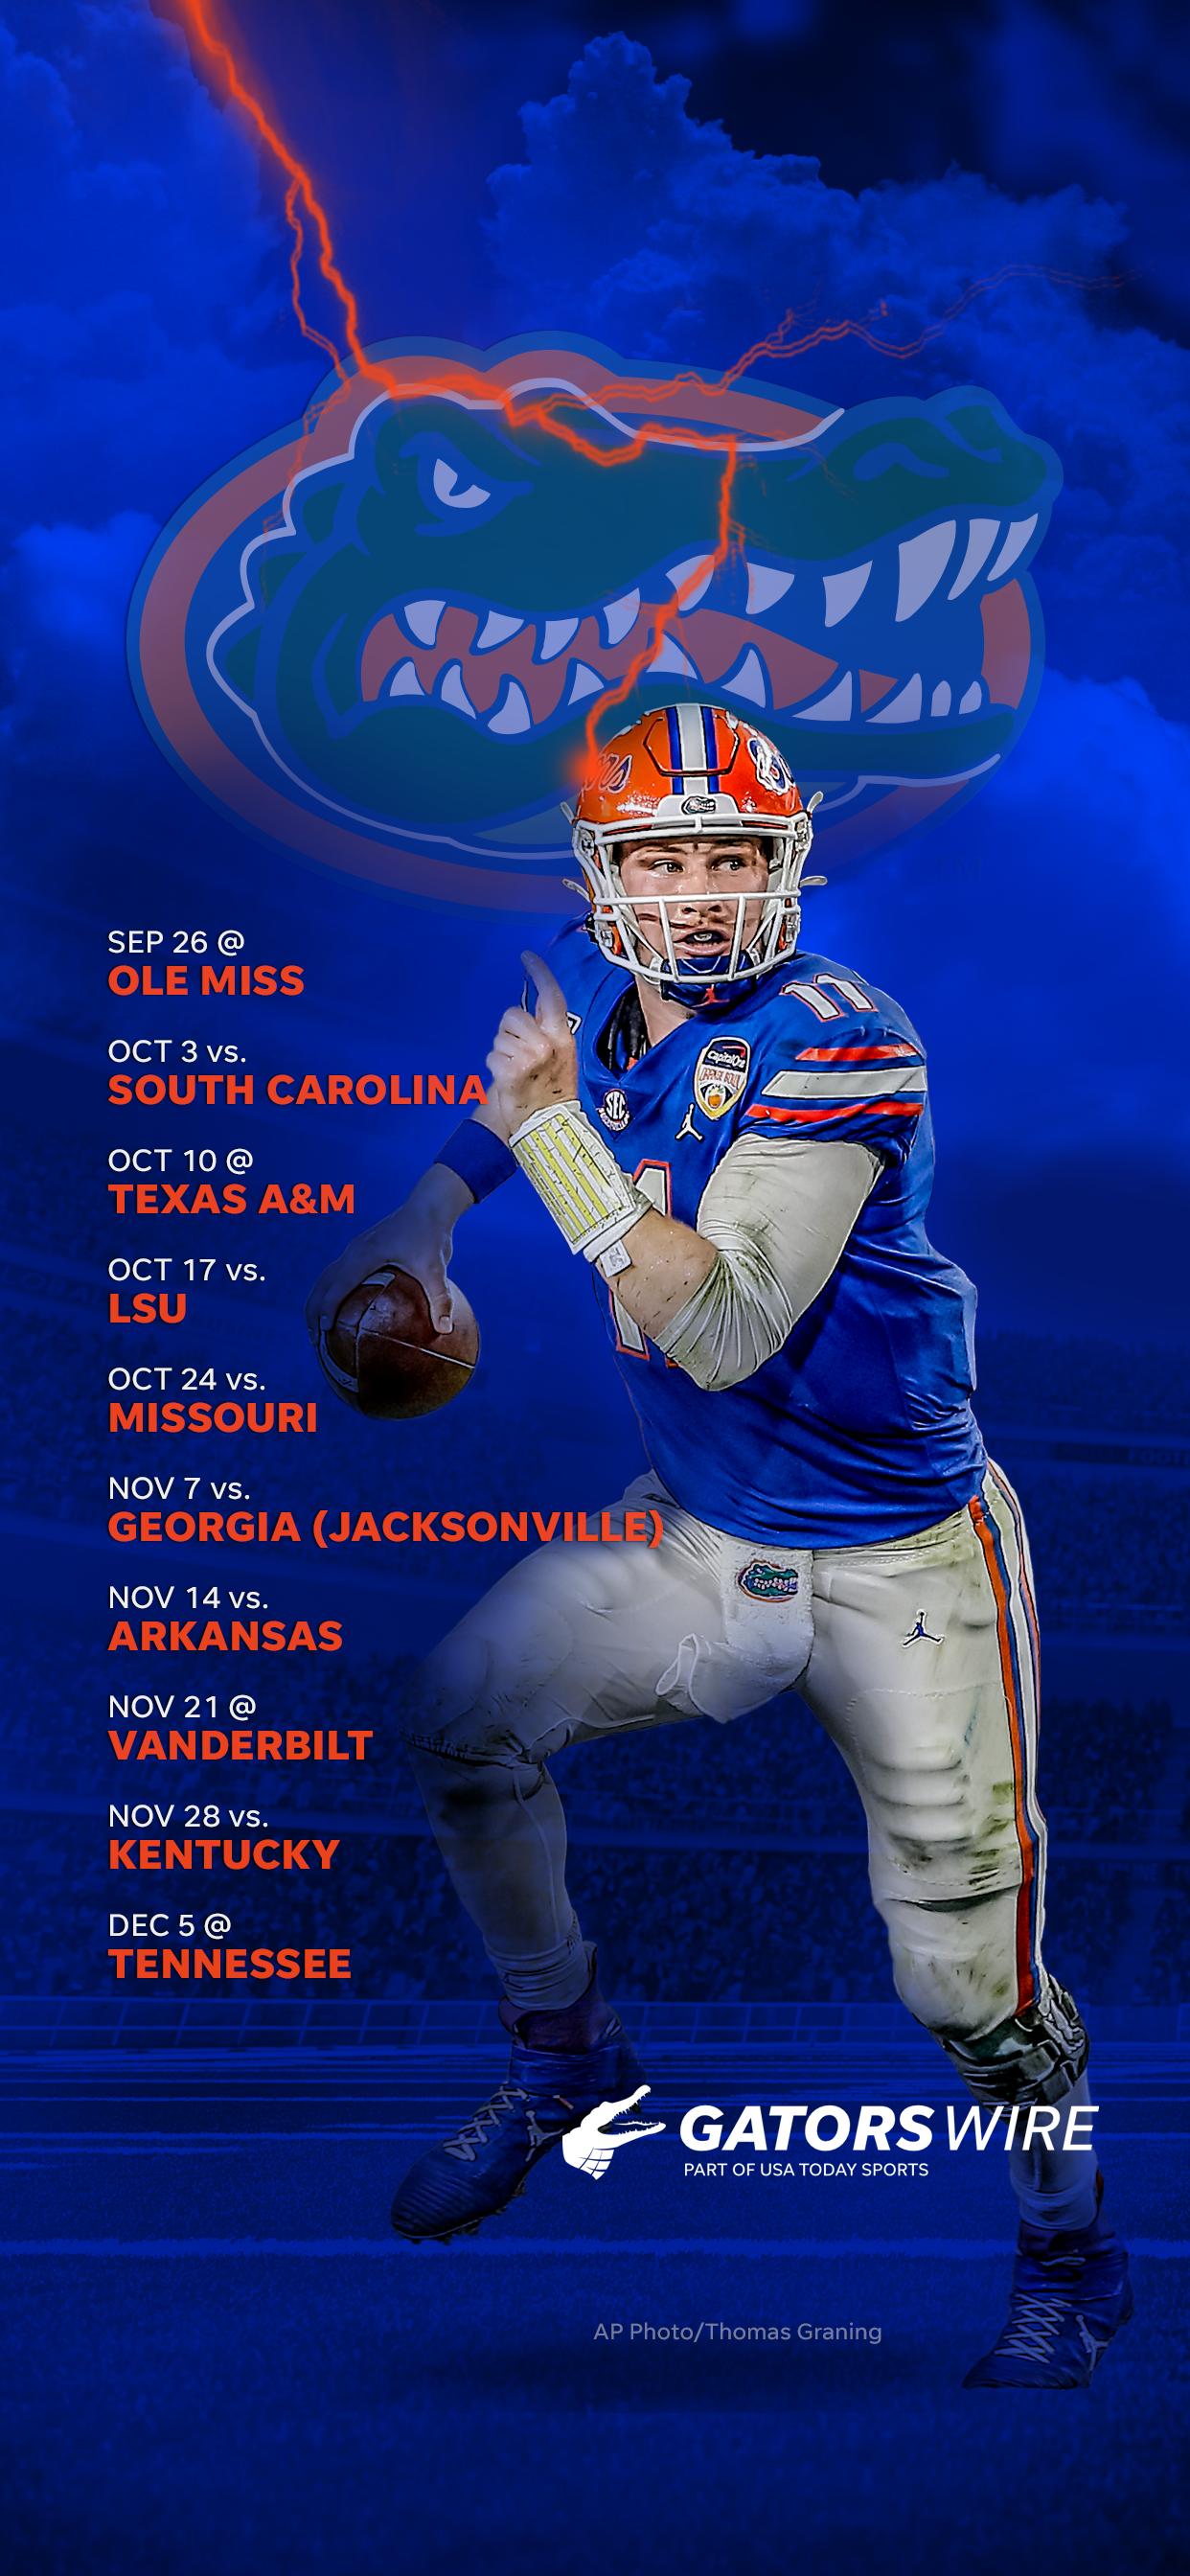 2020 Florida Gators Football Schedule Downloadable Wallpaper